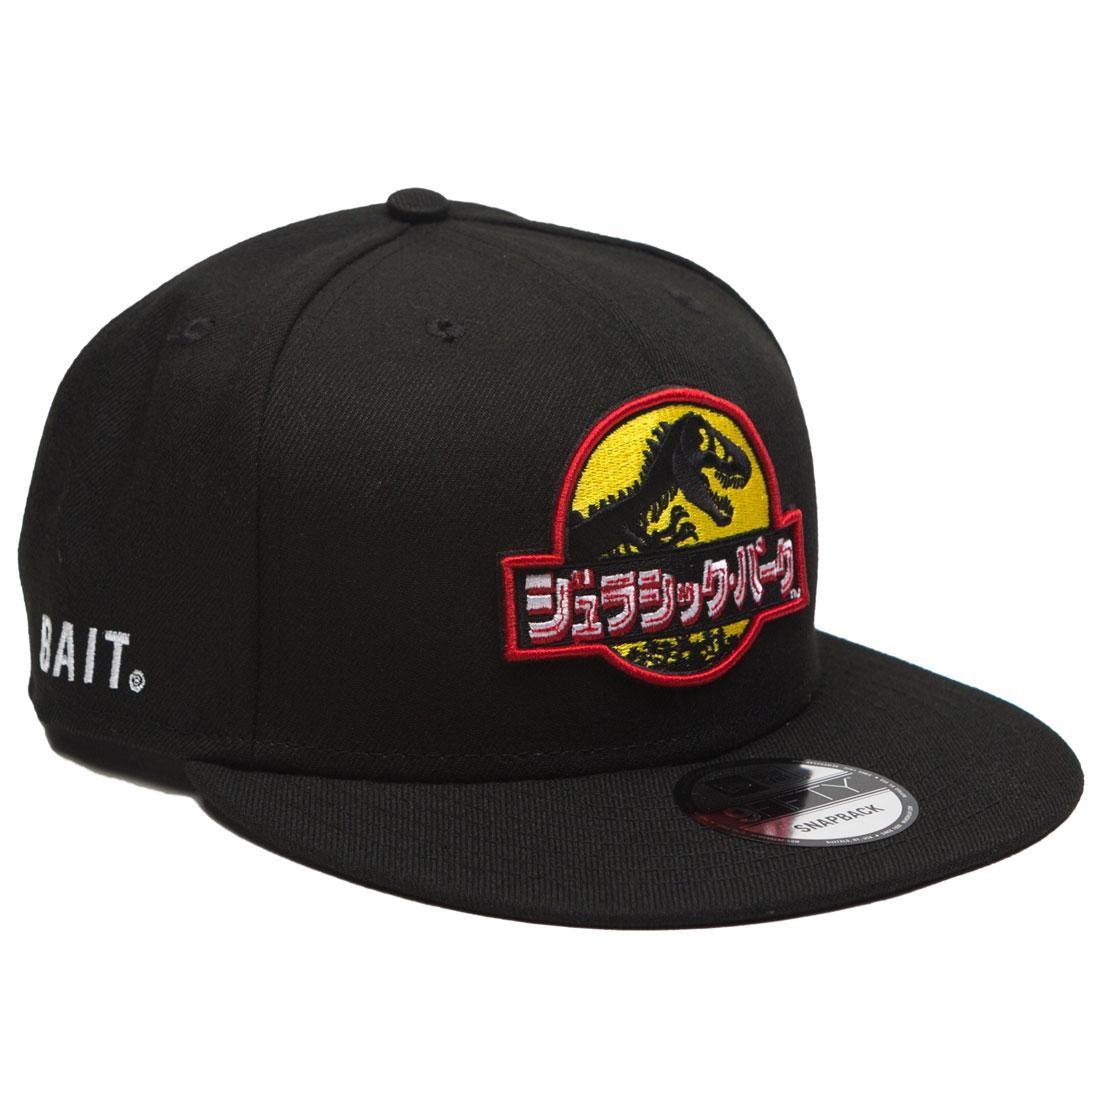 BAIT x Jurassic Park x New Era Damage Control Snapback Cap (black)